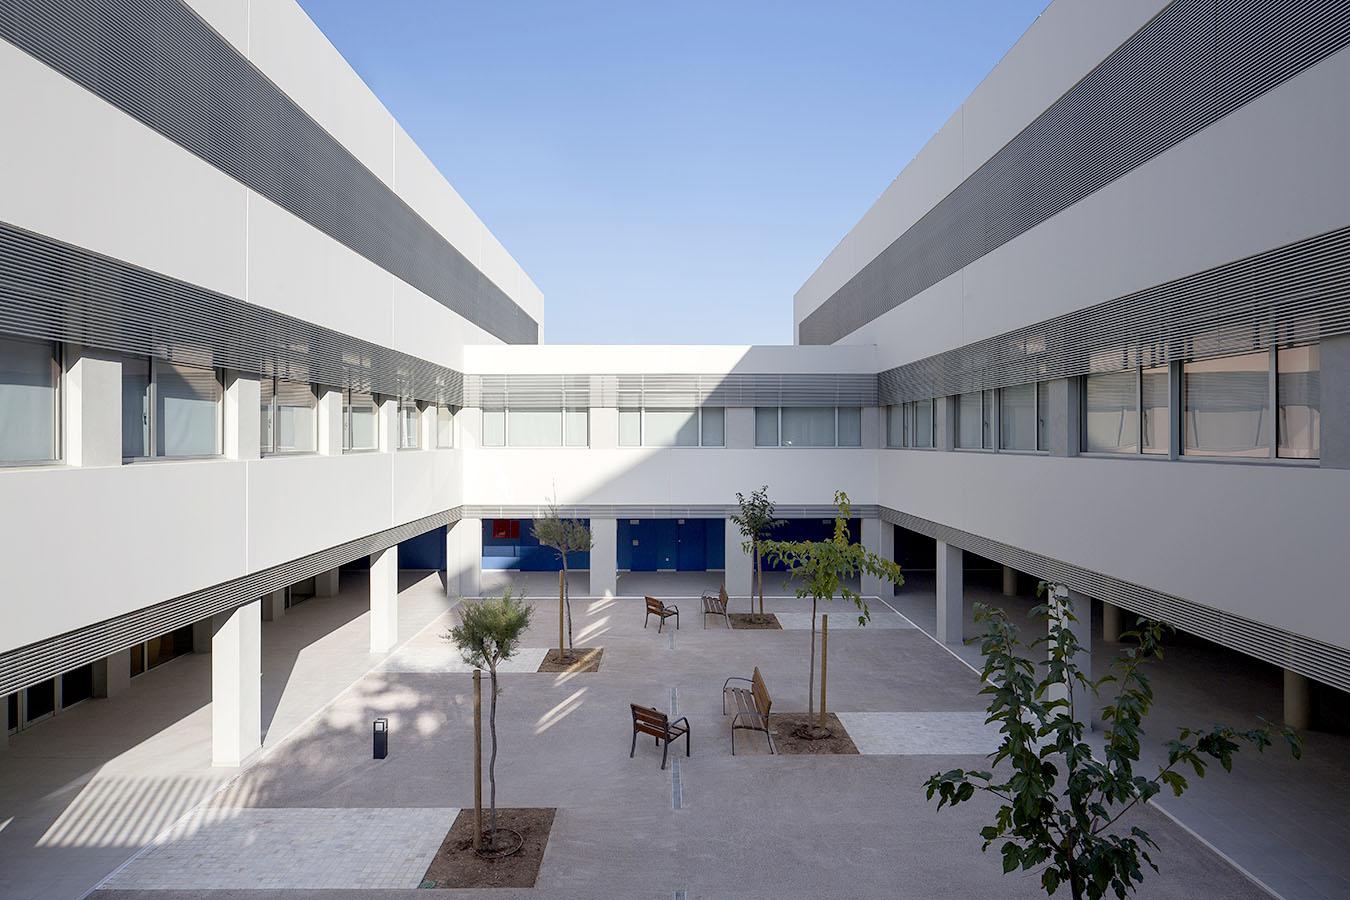 Centro Casa Caridad València